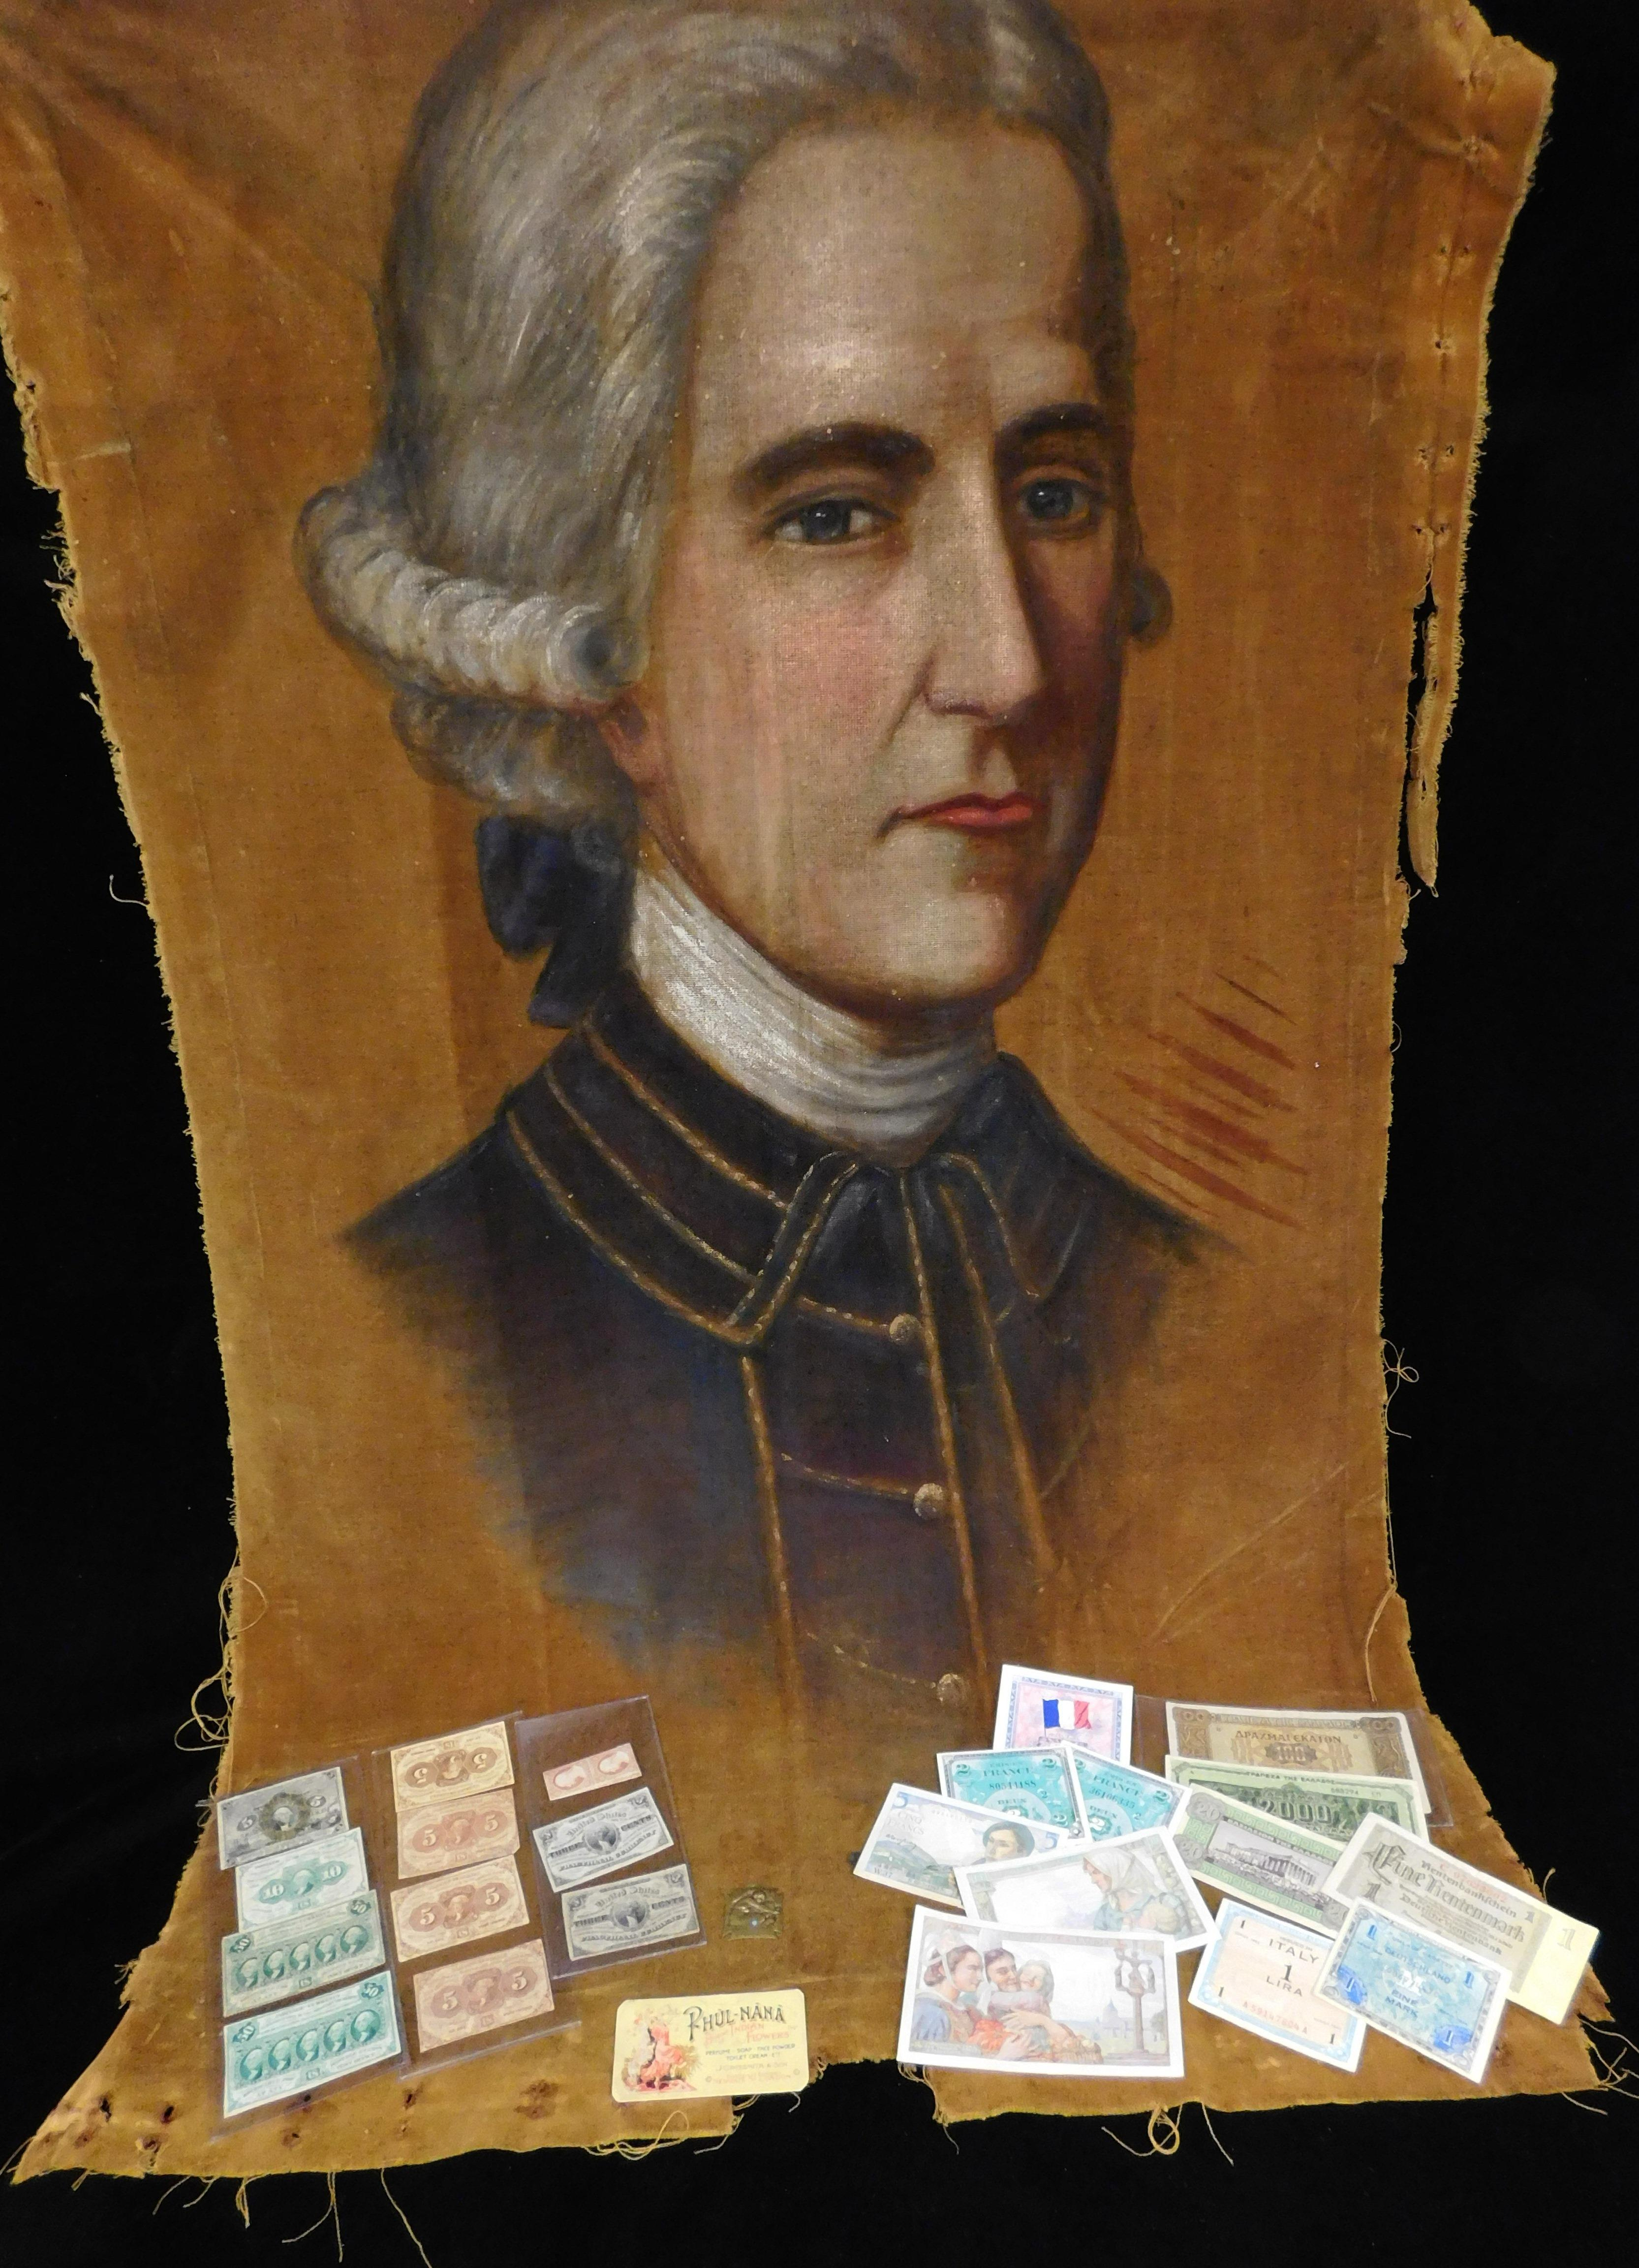 EPHEMERA: Twenty-five pieces of Civil War era currency and related ephemera, Civil War-era paper currency including: ten US Fraction...